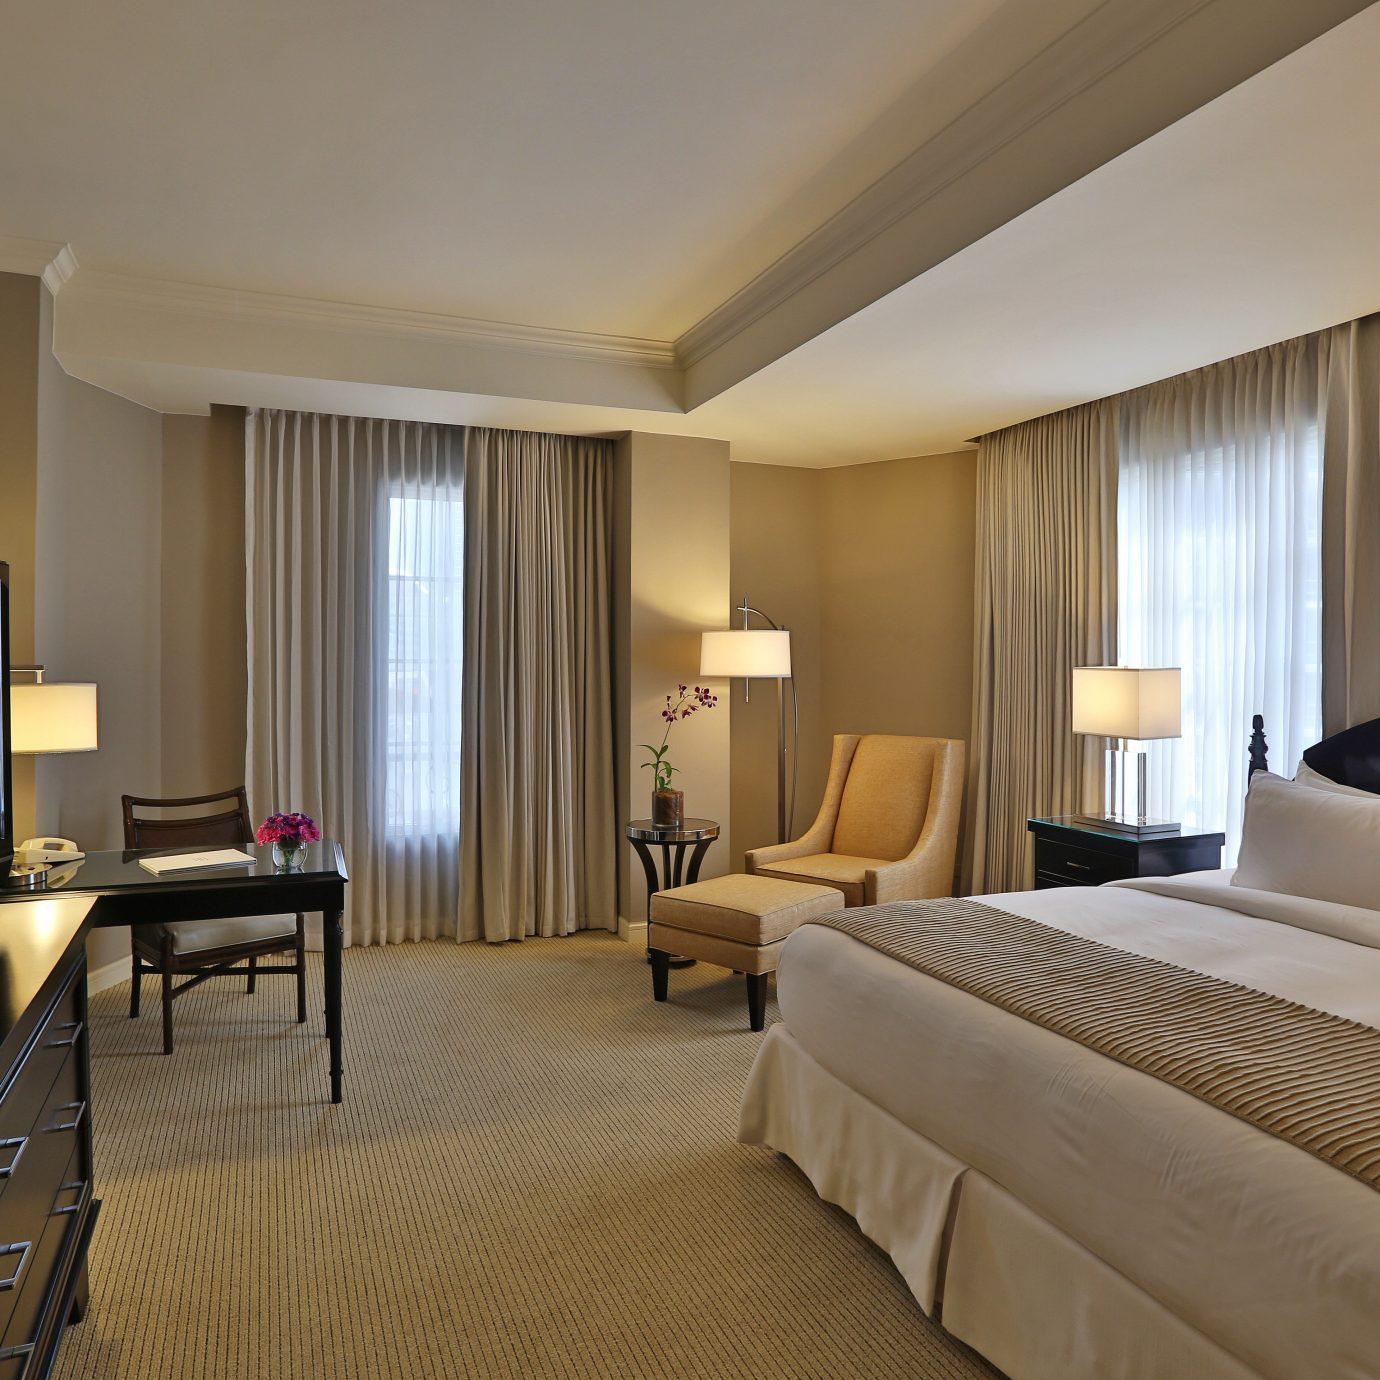 Bedroom Luxury Modern Scenic views property Suite condominium flat